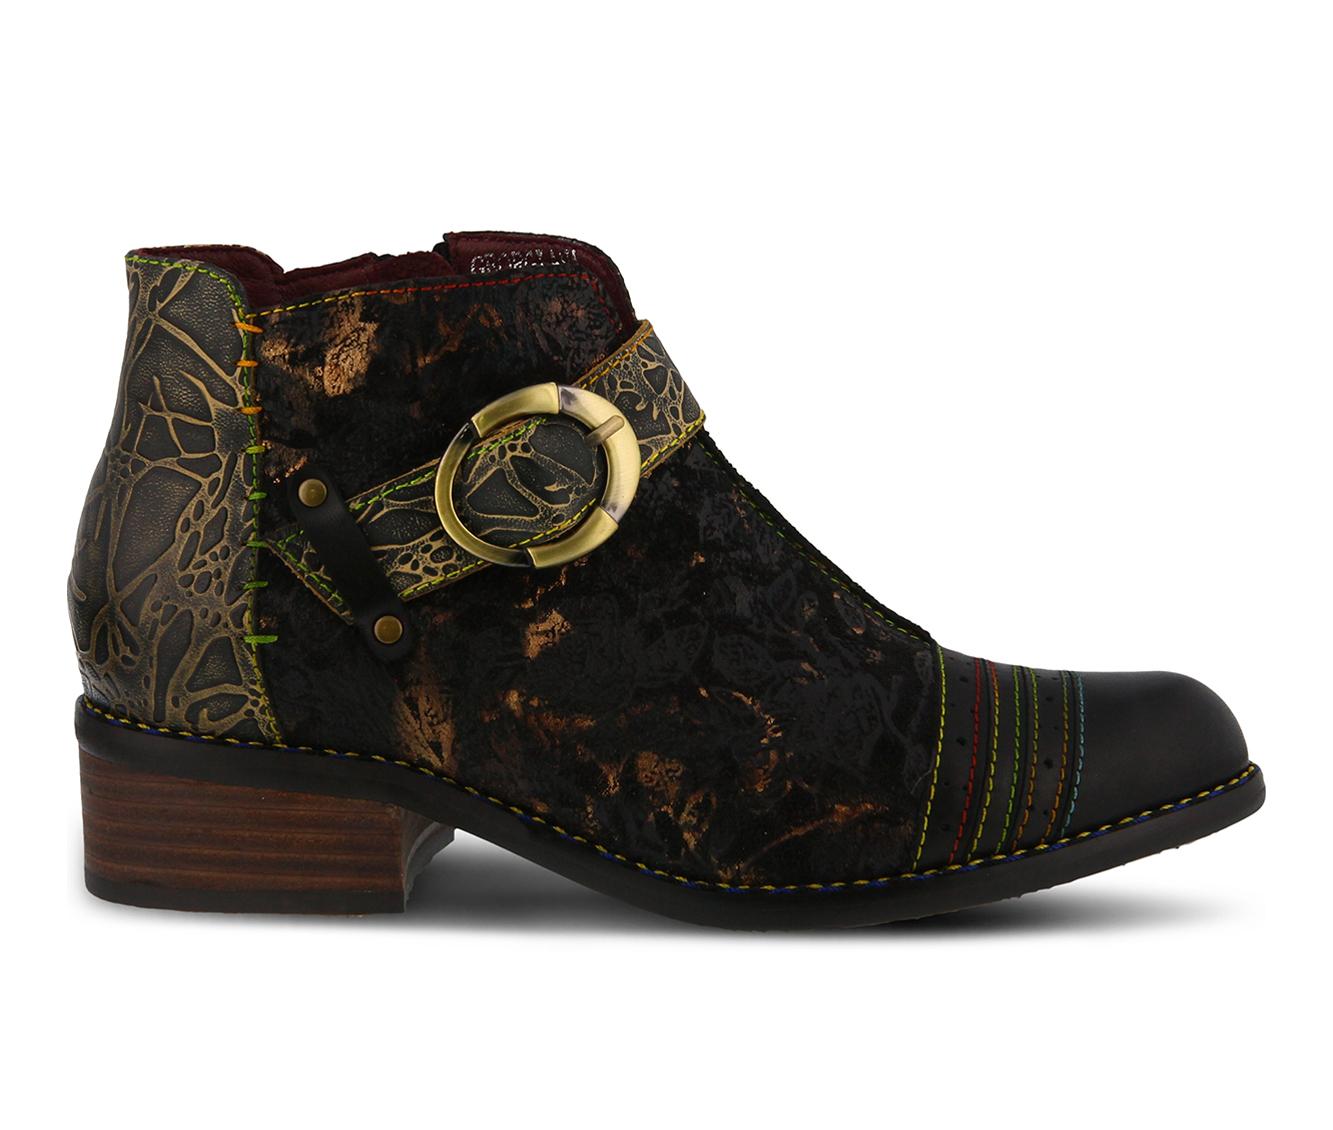 L'Artiste Georgiana Women's Boots (Black Leather)